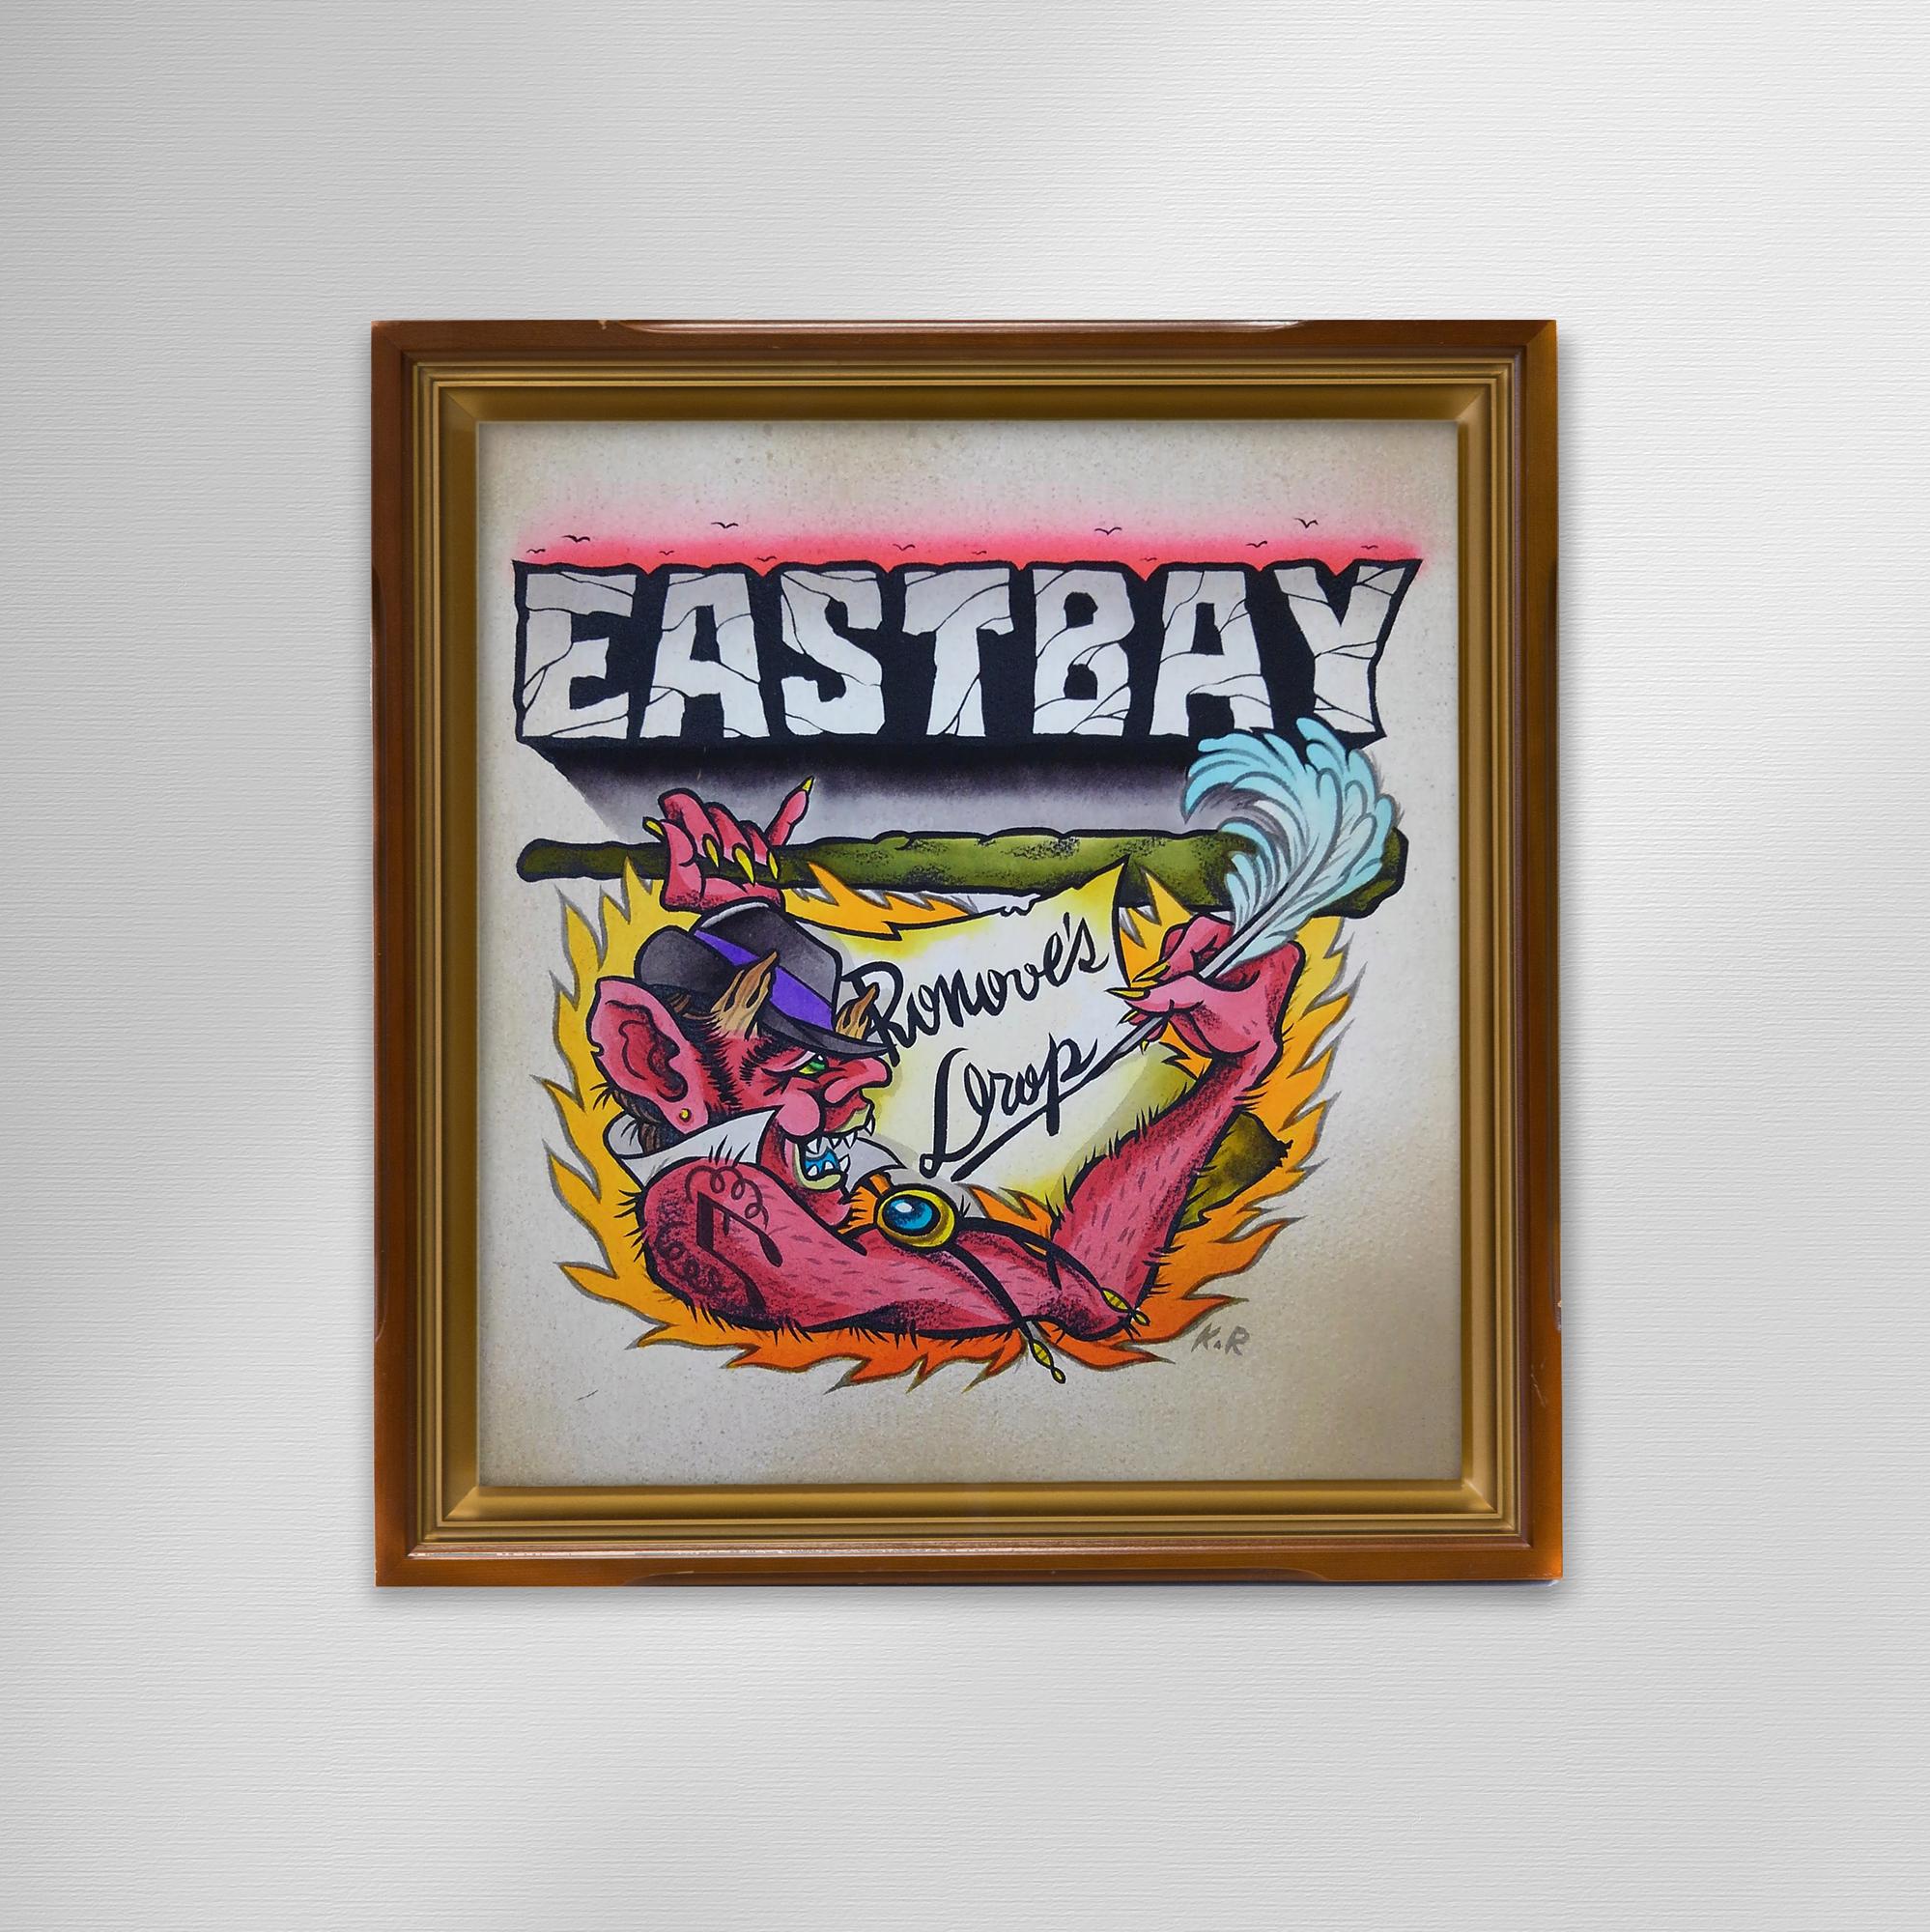 KING RAT TATTOO 作品 | LAVA gallery | Tattoo artist: Yuji Anai | キングラット | ラバギャラリー | タトゥーアート | 福岡県北九州市 | KIMG1466